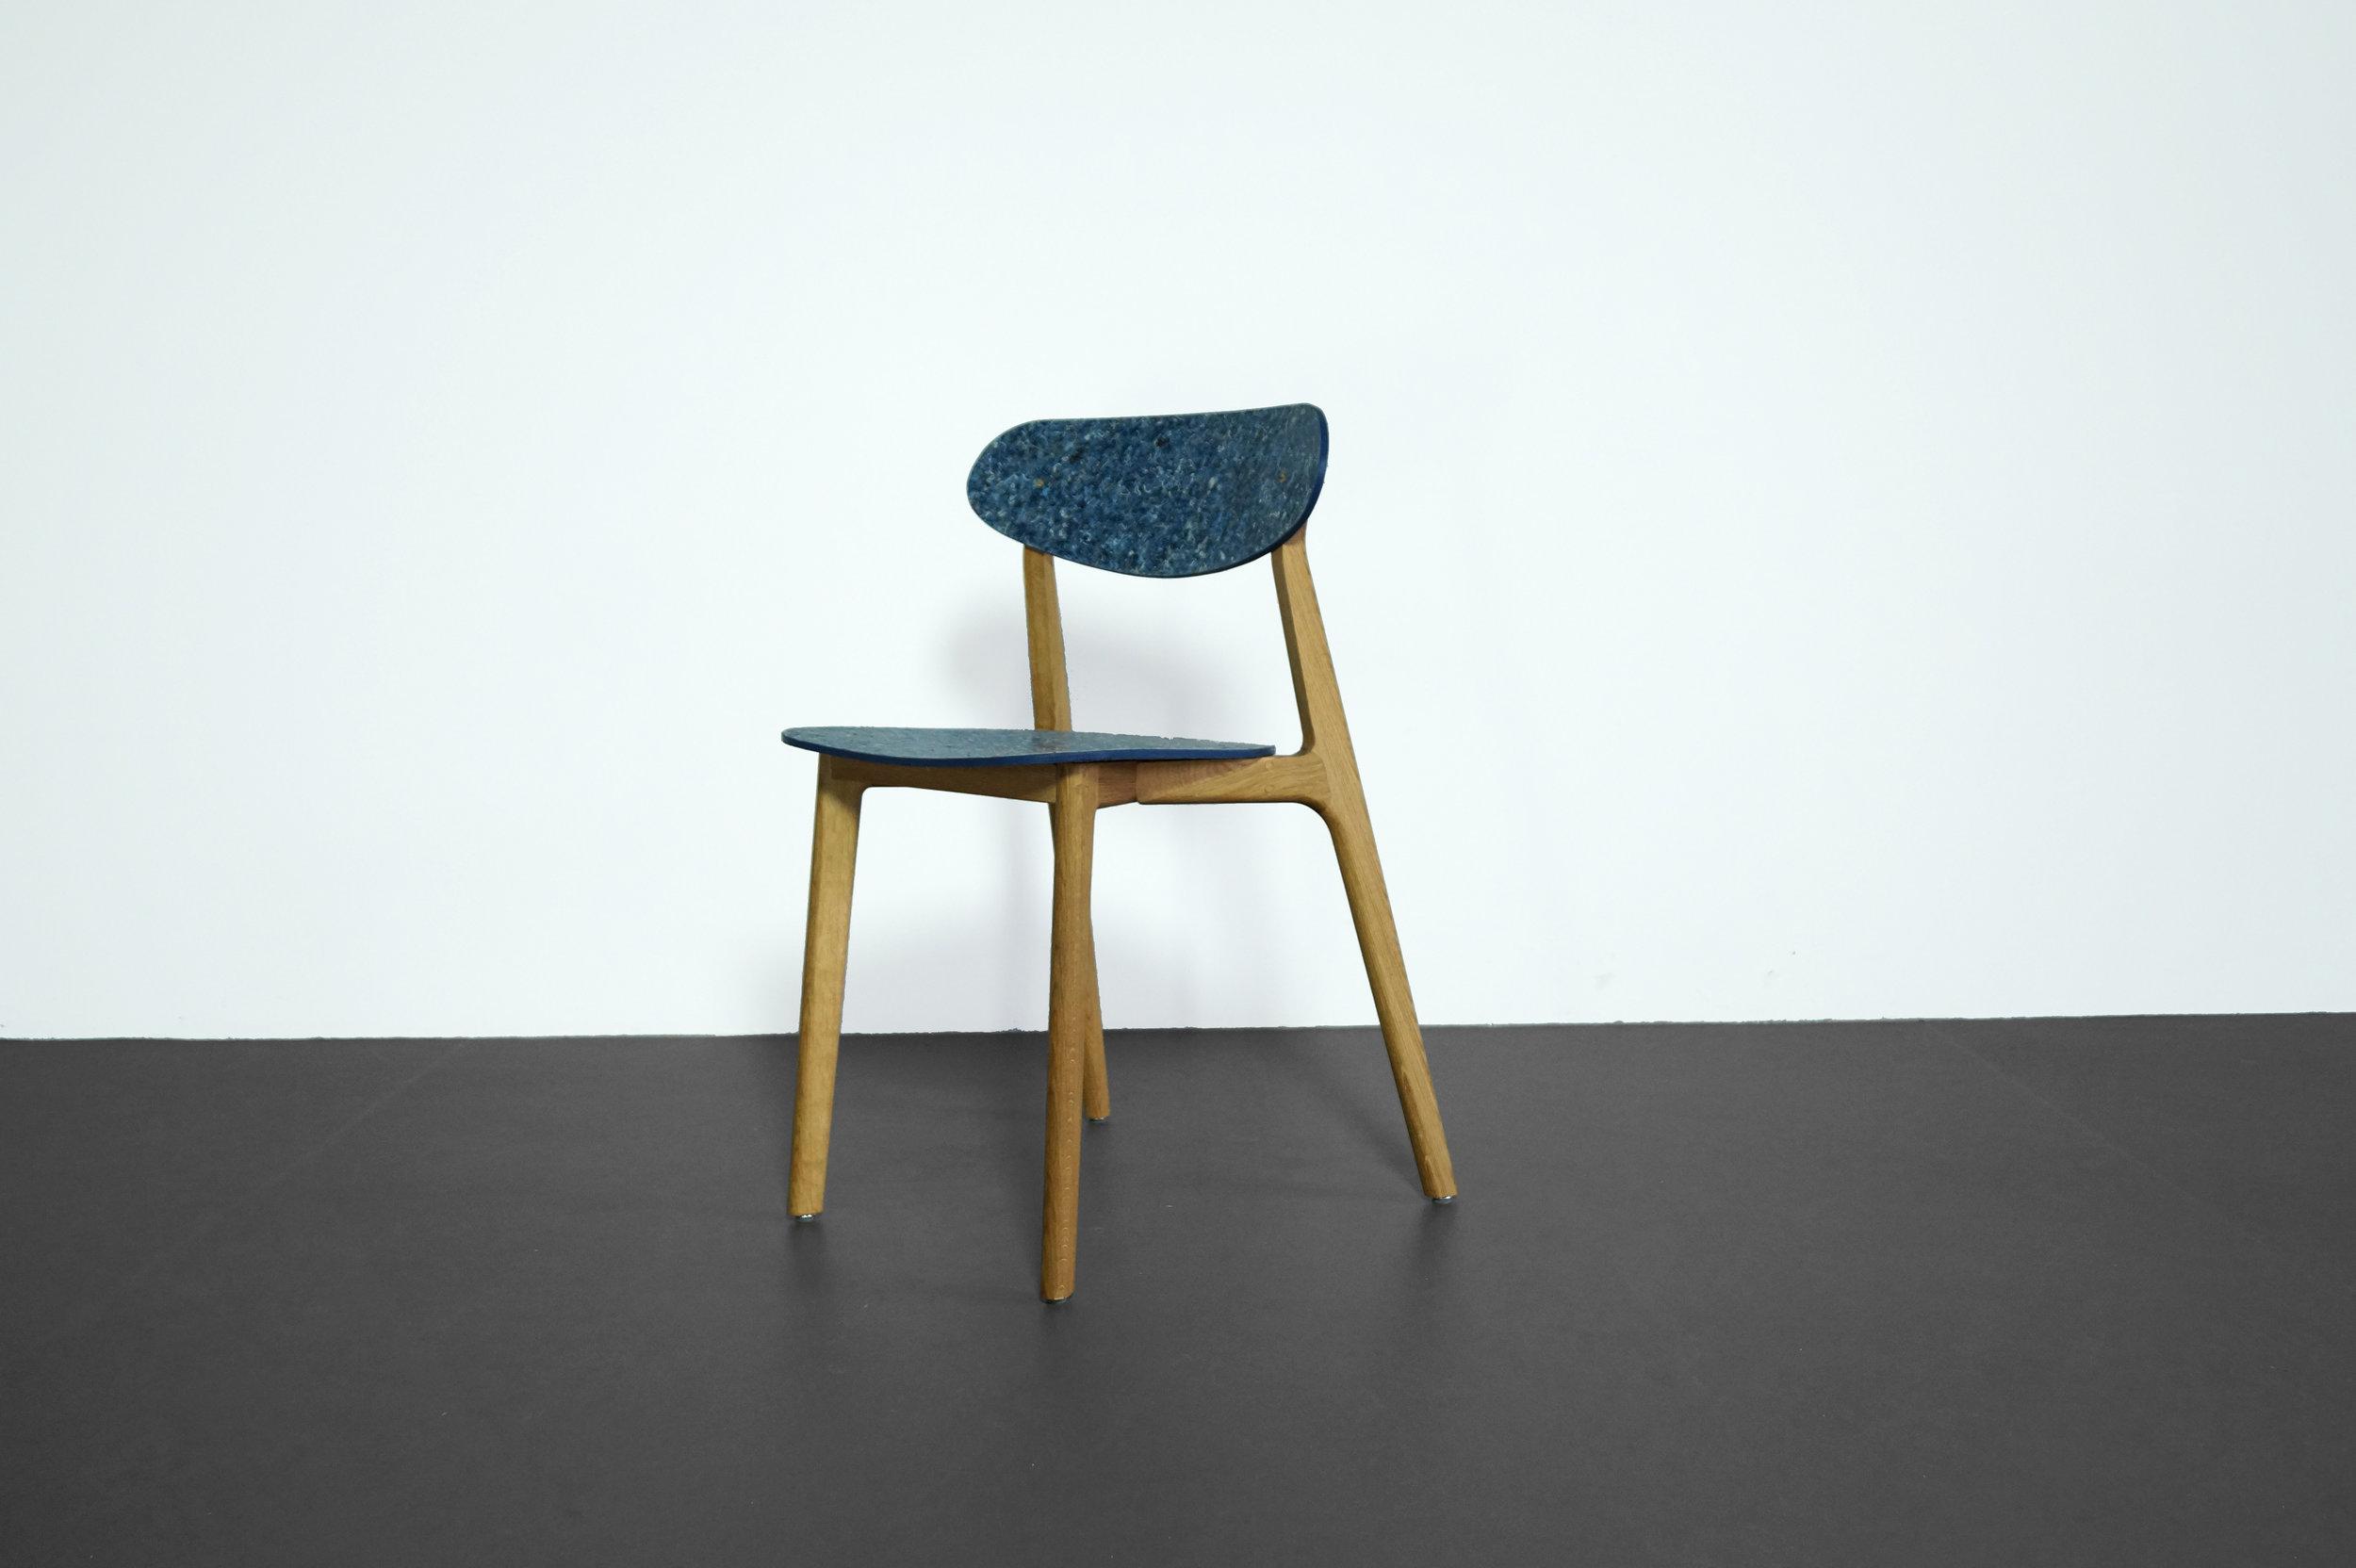 Ubu_Chair_Denim_01.JPG